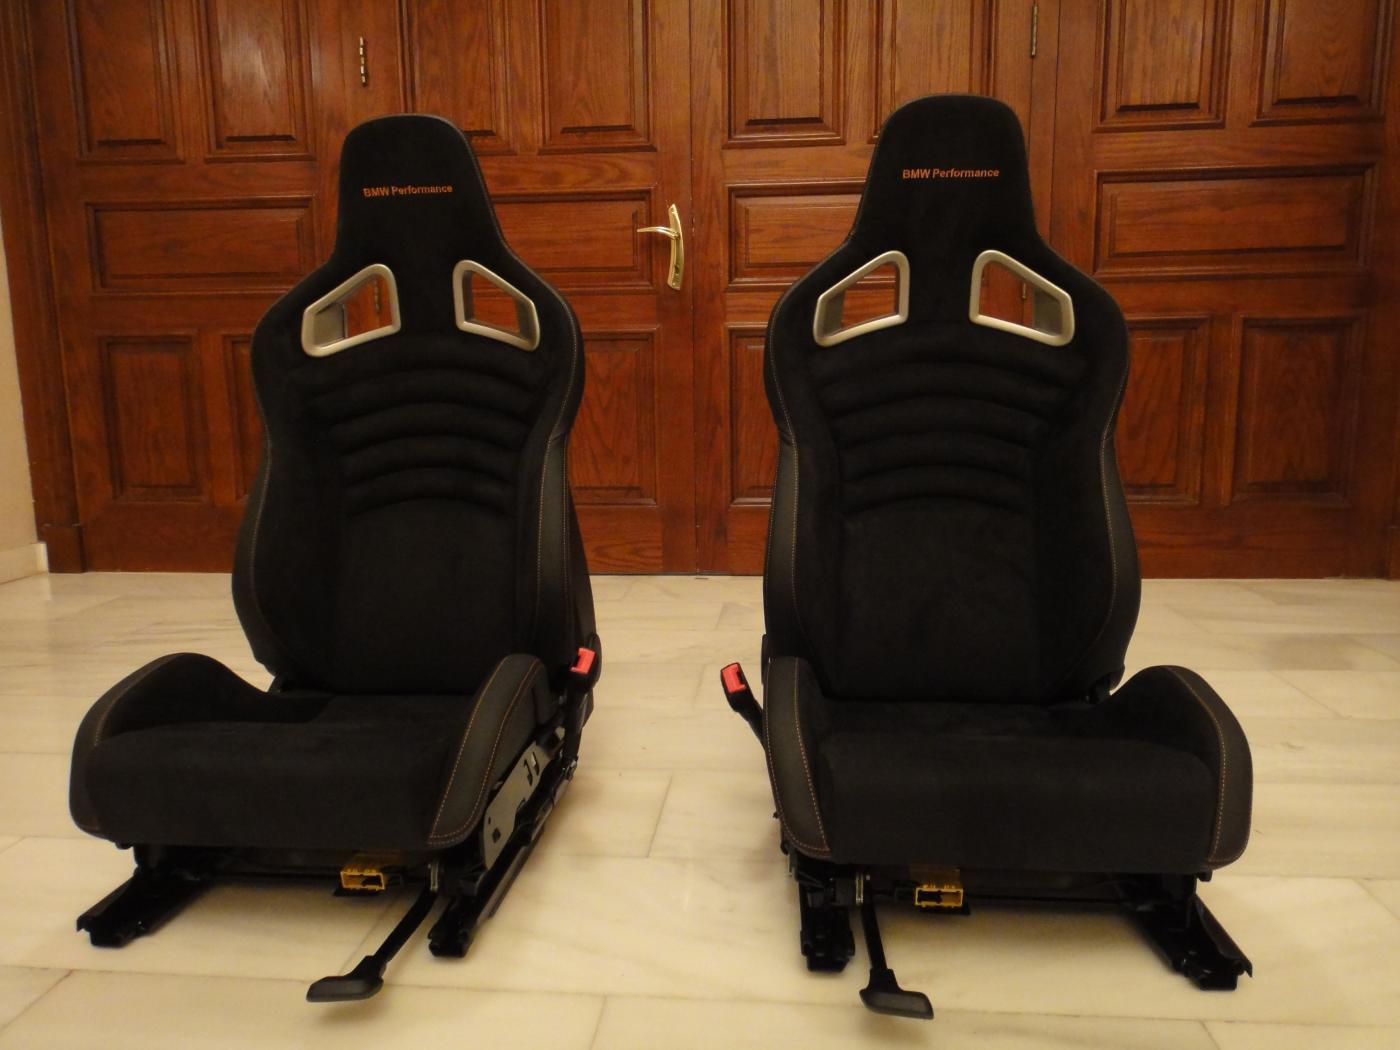 Bmw Performance Seats Amp Steering Wheel With Orange Stitching